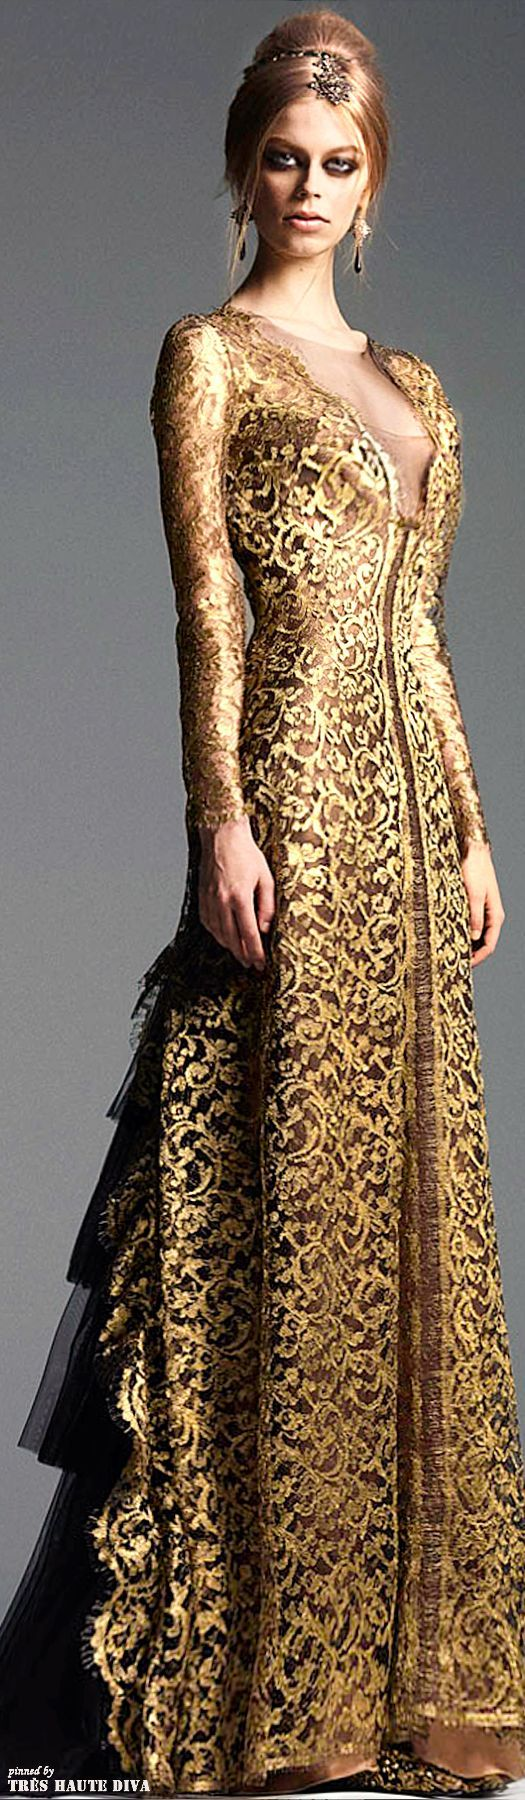 Billionaire Club / karen cox. The Glamorous Life. (Alberta Ferretti Style)